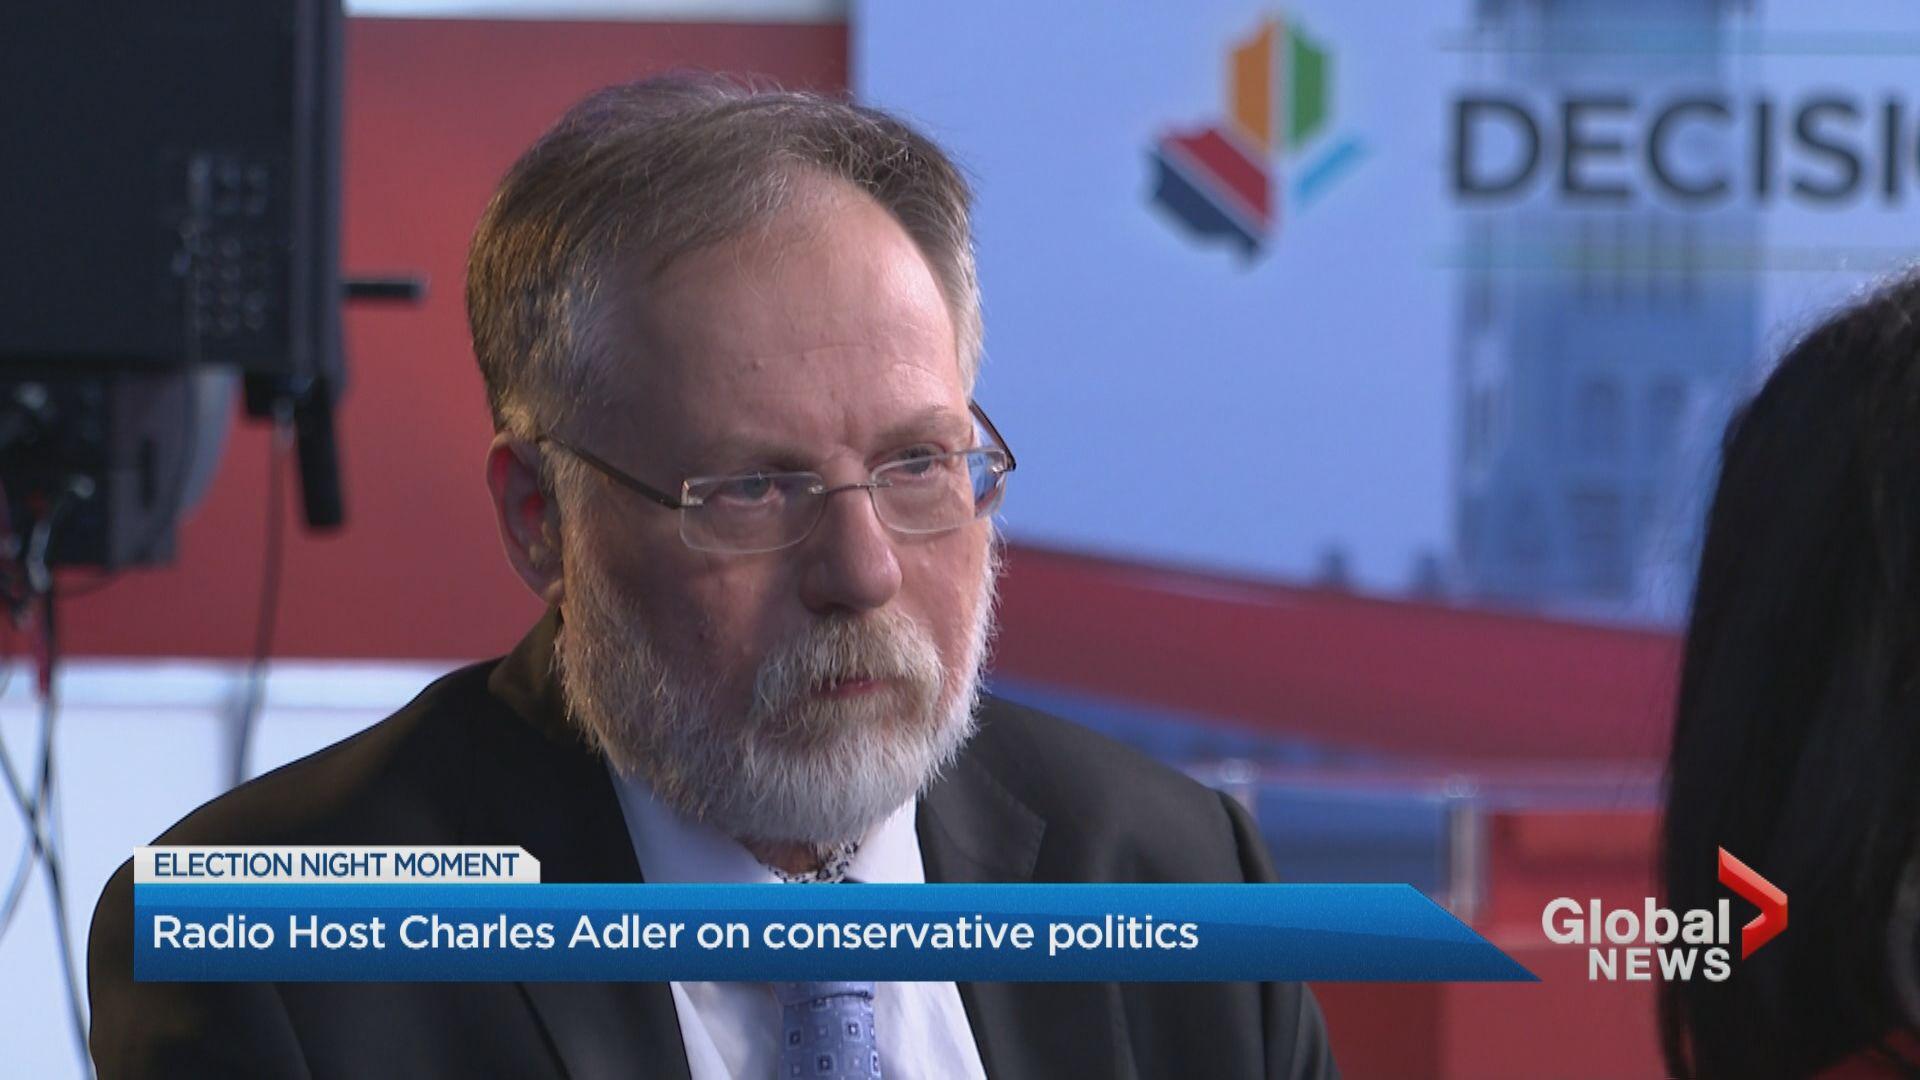 Radio host Charles Adler on conservative politics